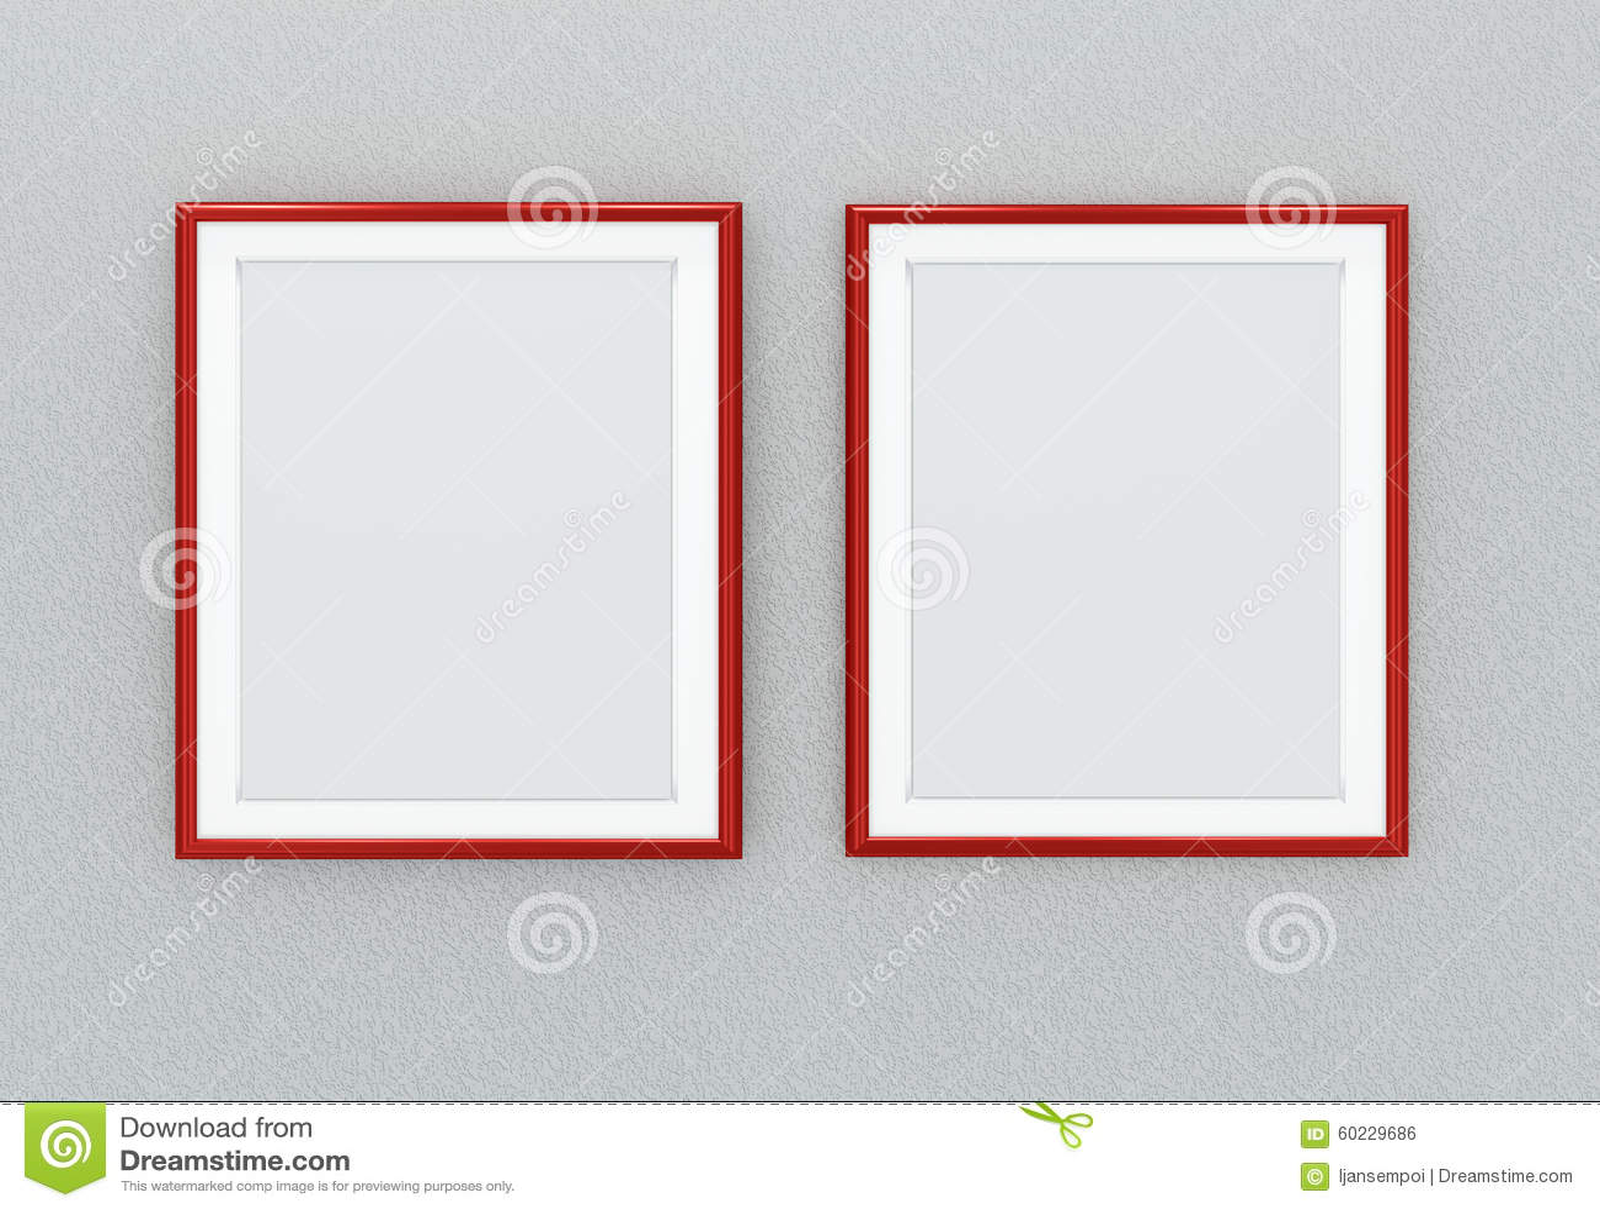 Rote Bilderrahmen stock abbildung. Illustration von leer - 60229686